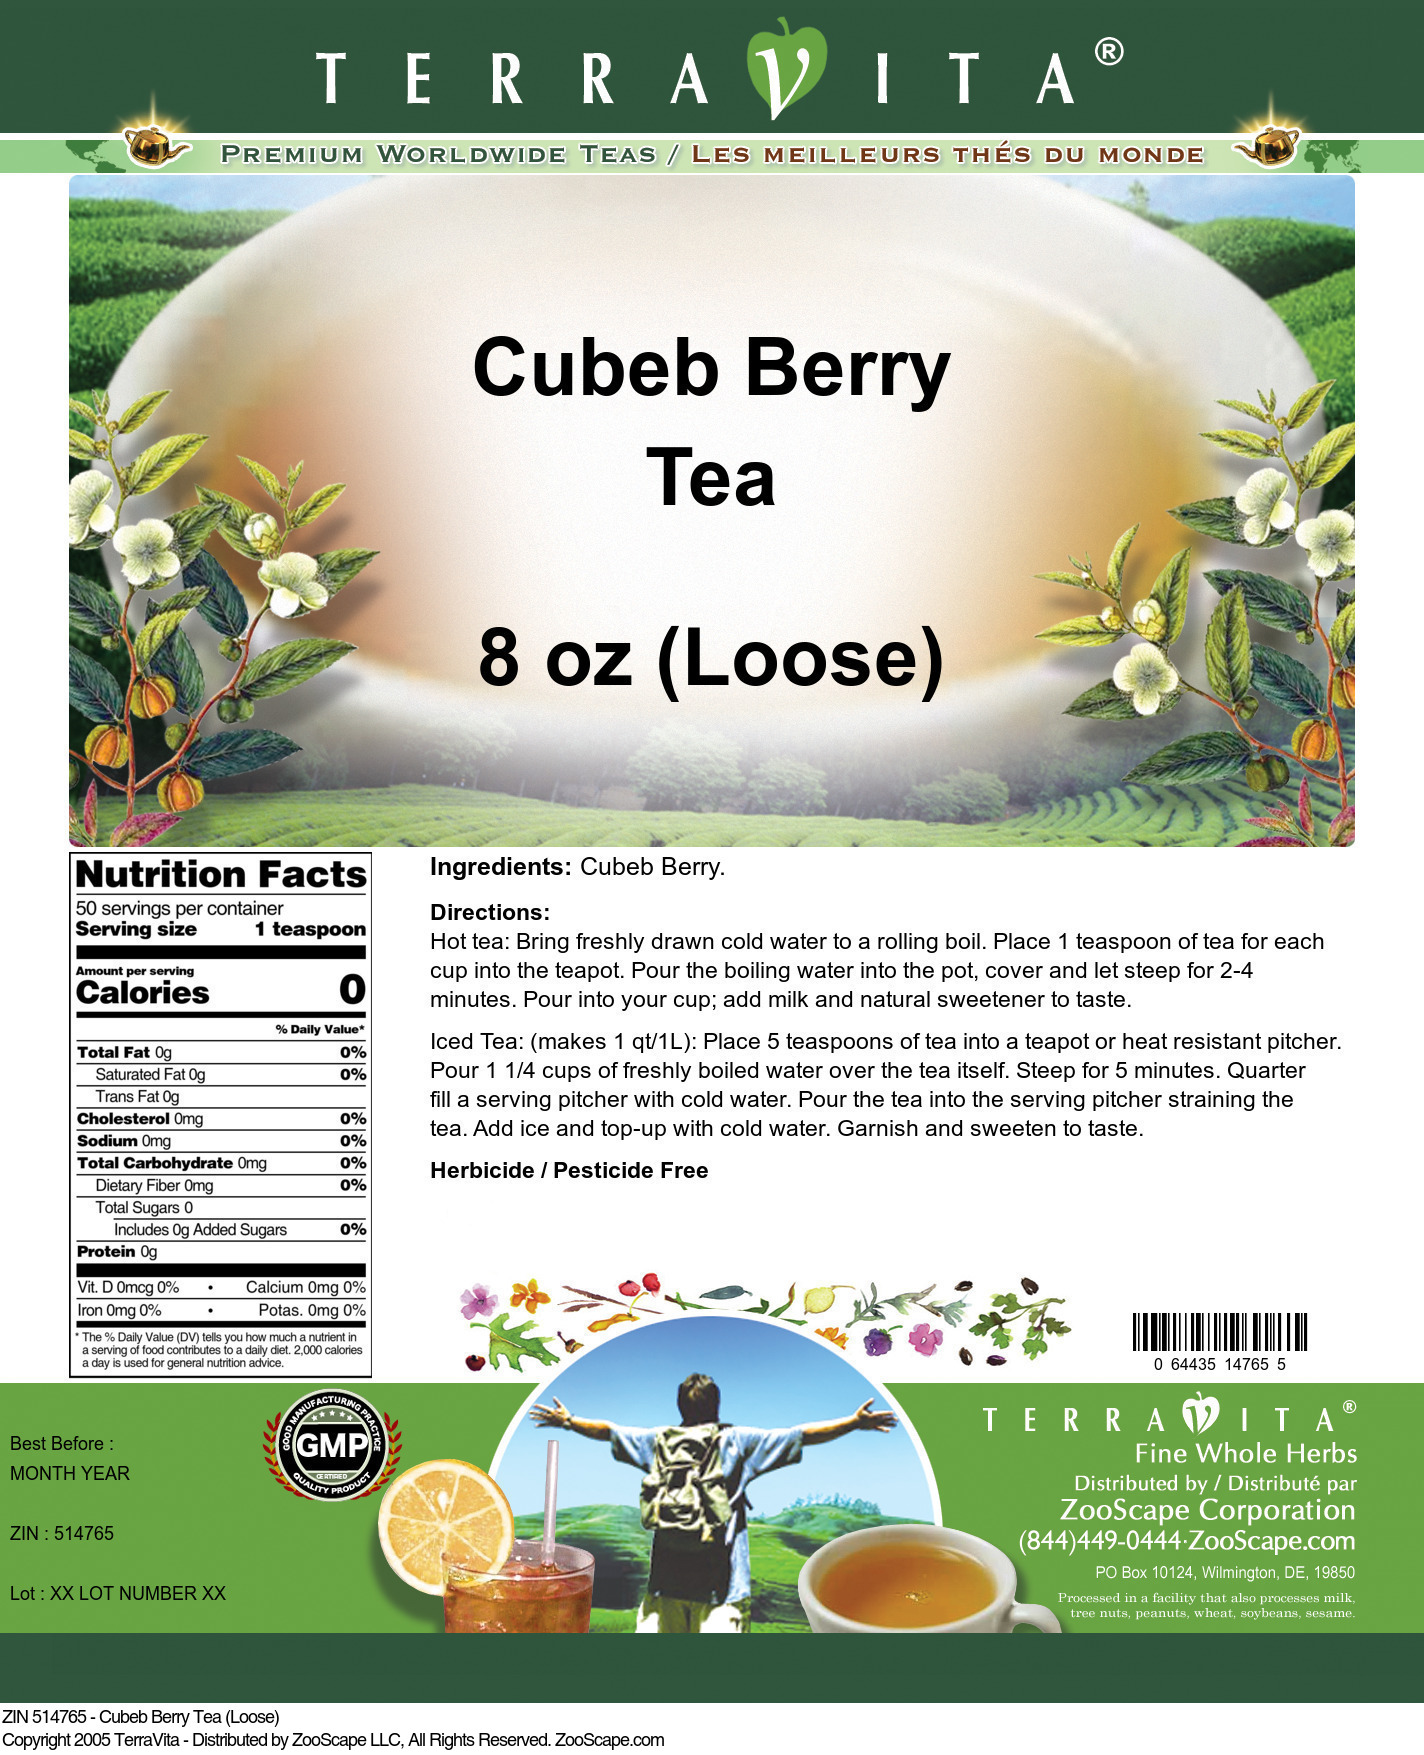 Cubeb Berry Tea (Loose)